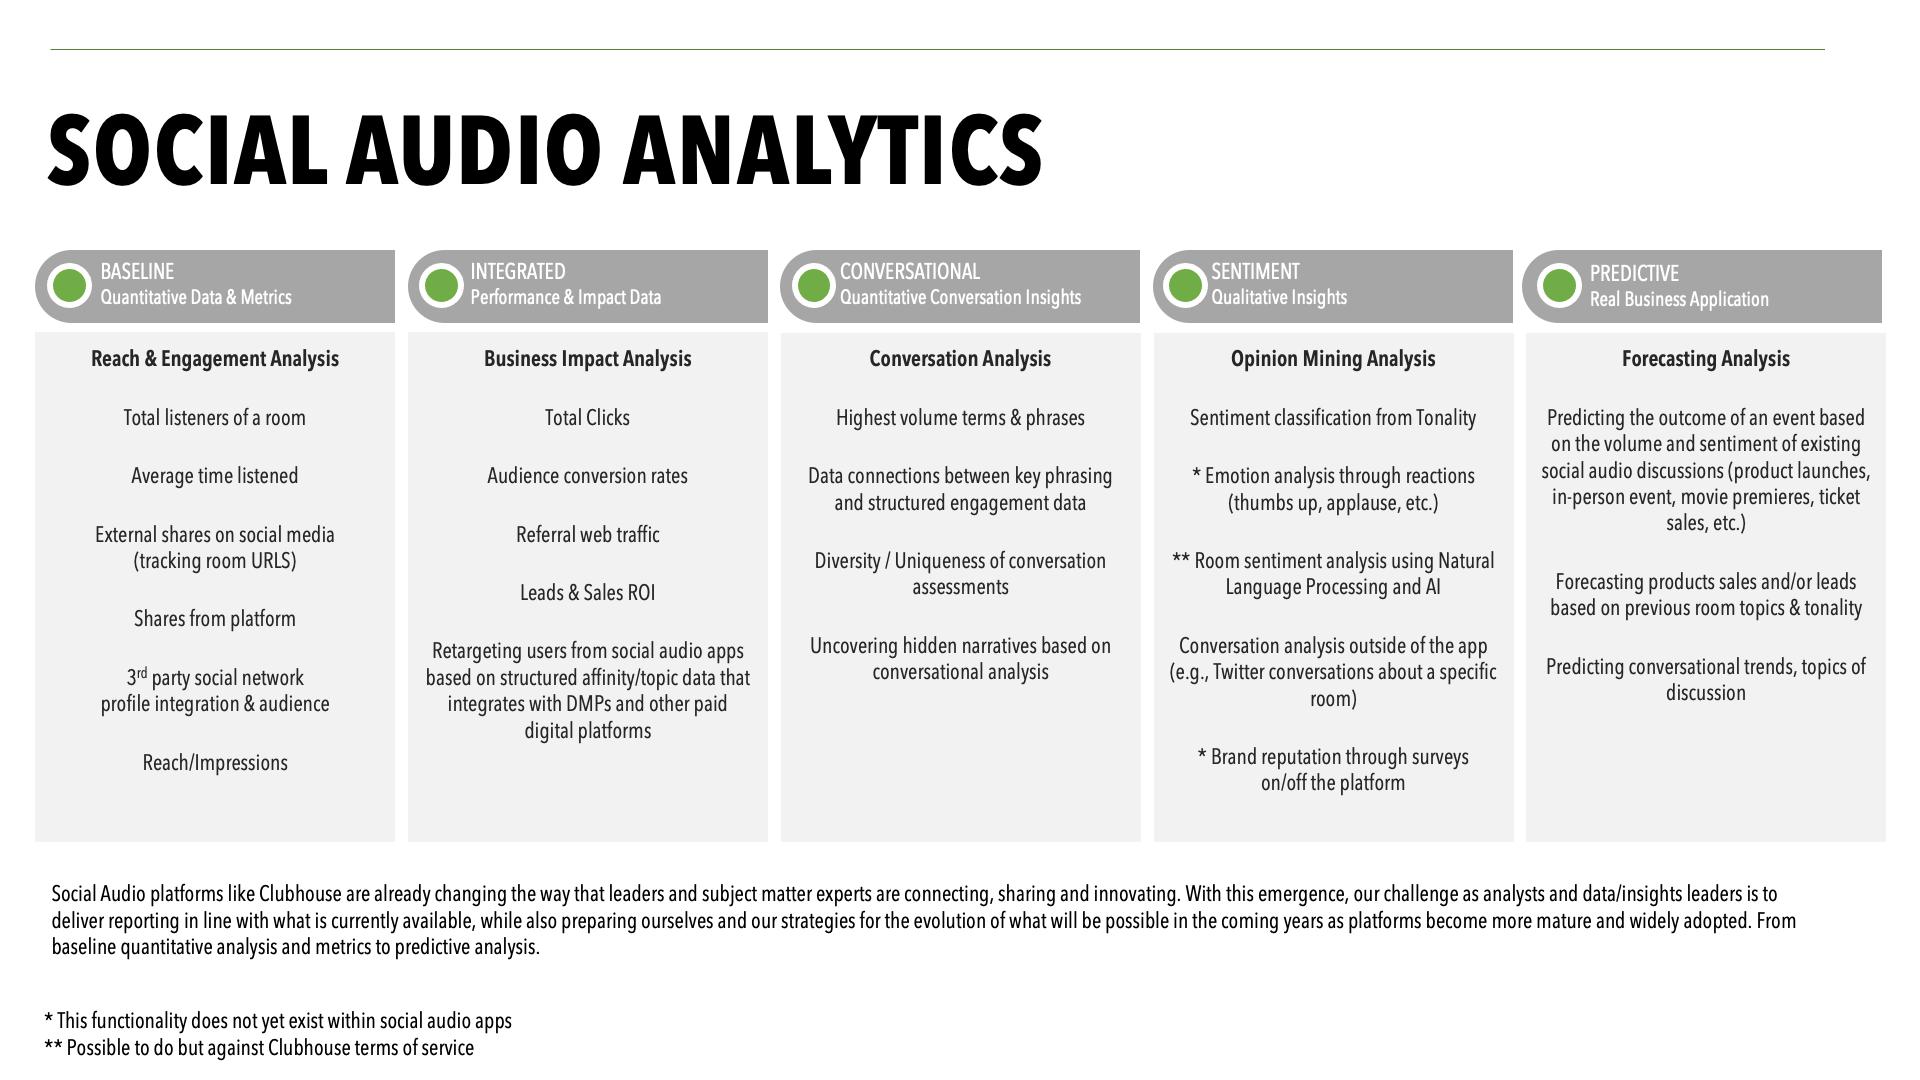 Measuring Social Audio